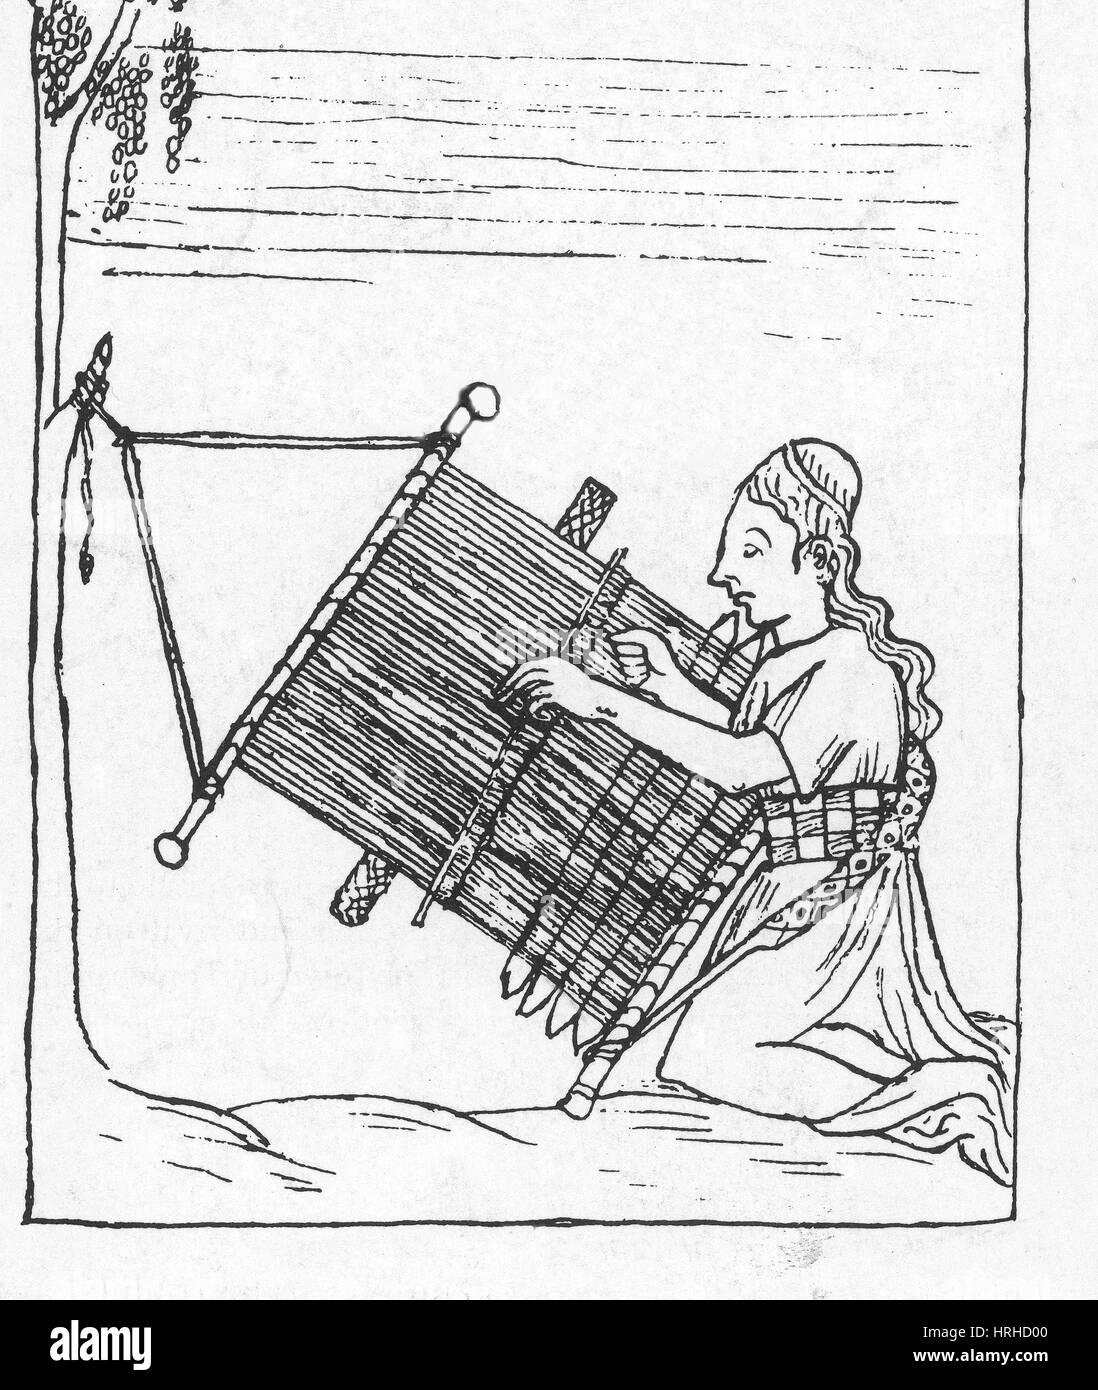 Incan Woman Weaving, 17th Century Codex - Stock Image